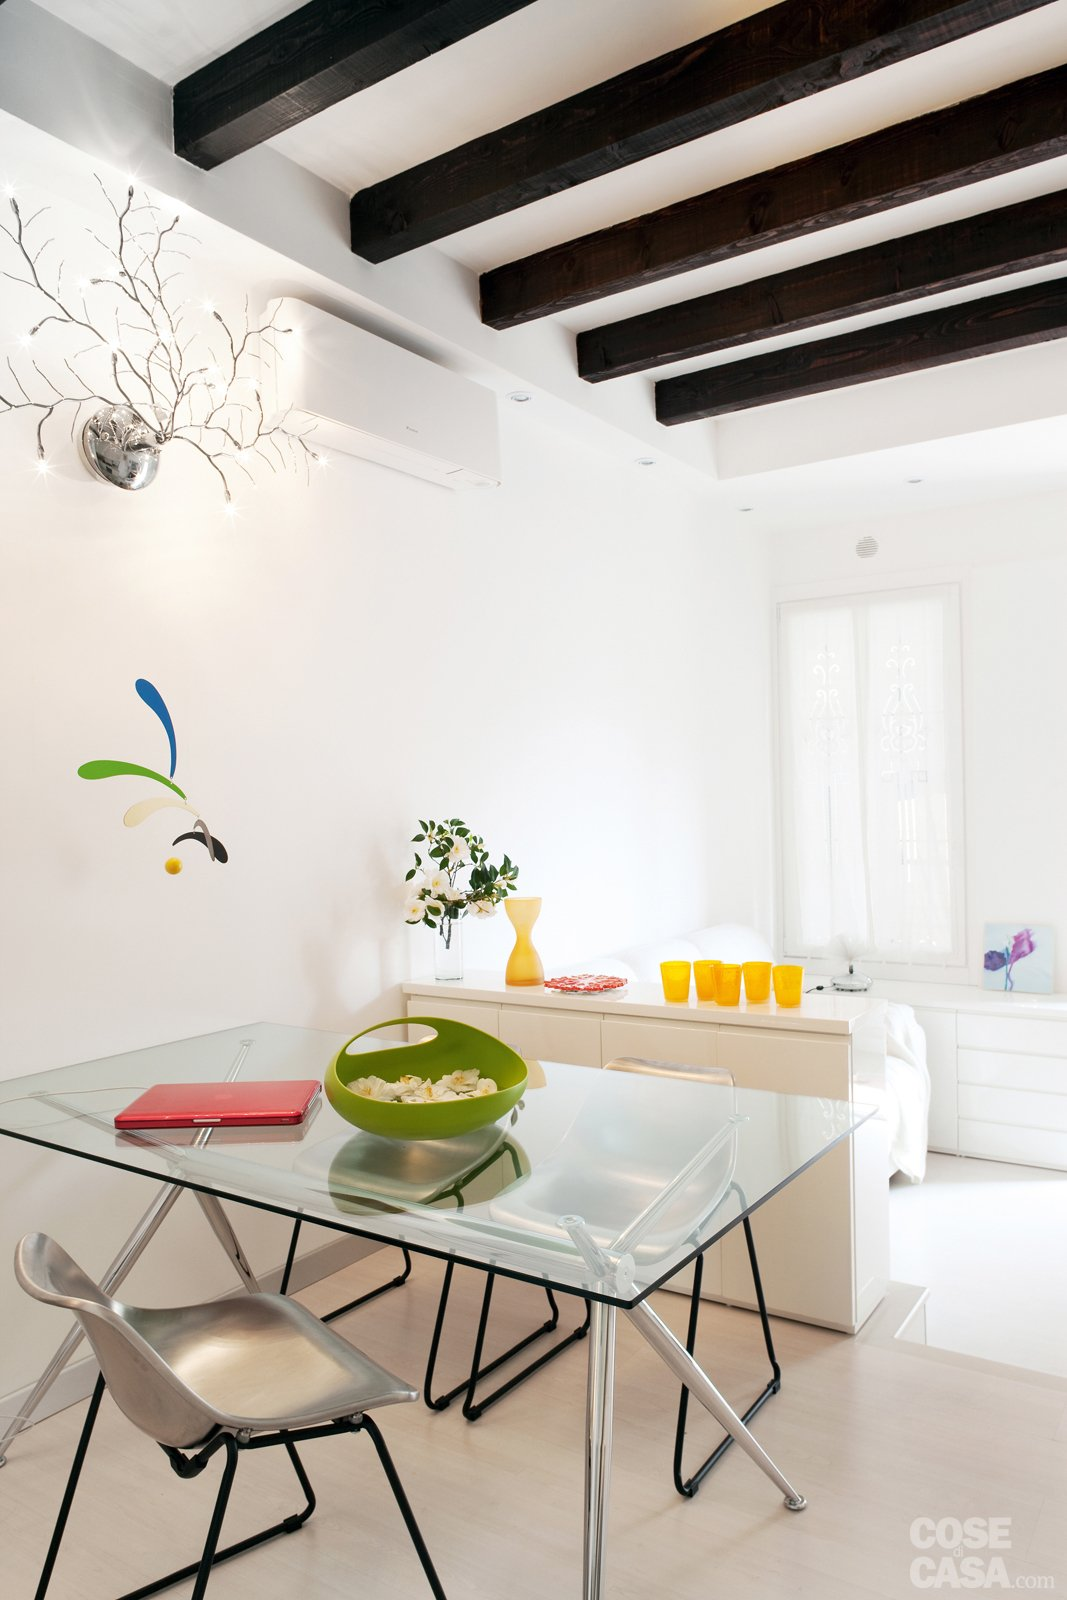 Una Casa Di 35 Mq Sfruttati Al Massimo Cose Di Casa #C29509 1067 1600 Sala Da Pranzo Chateau D'ax